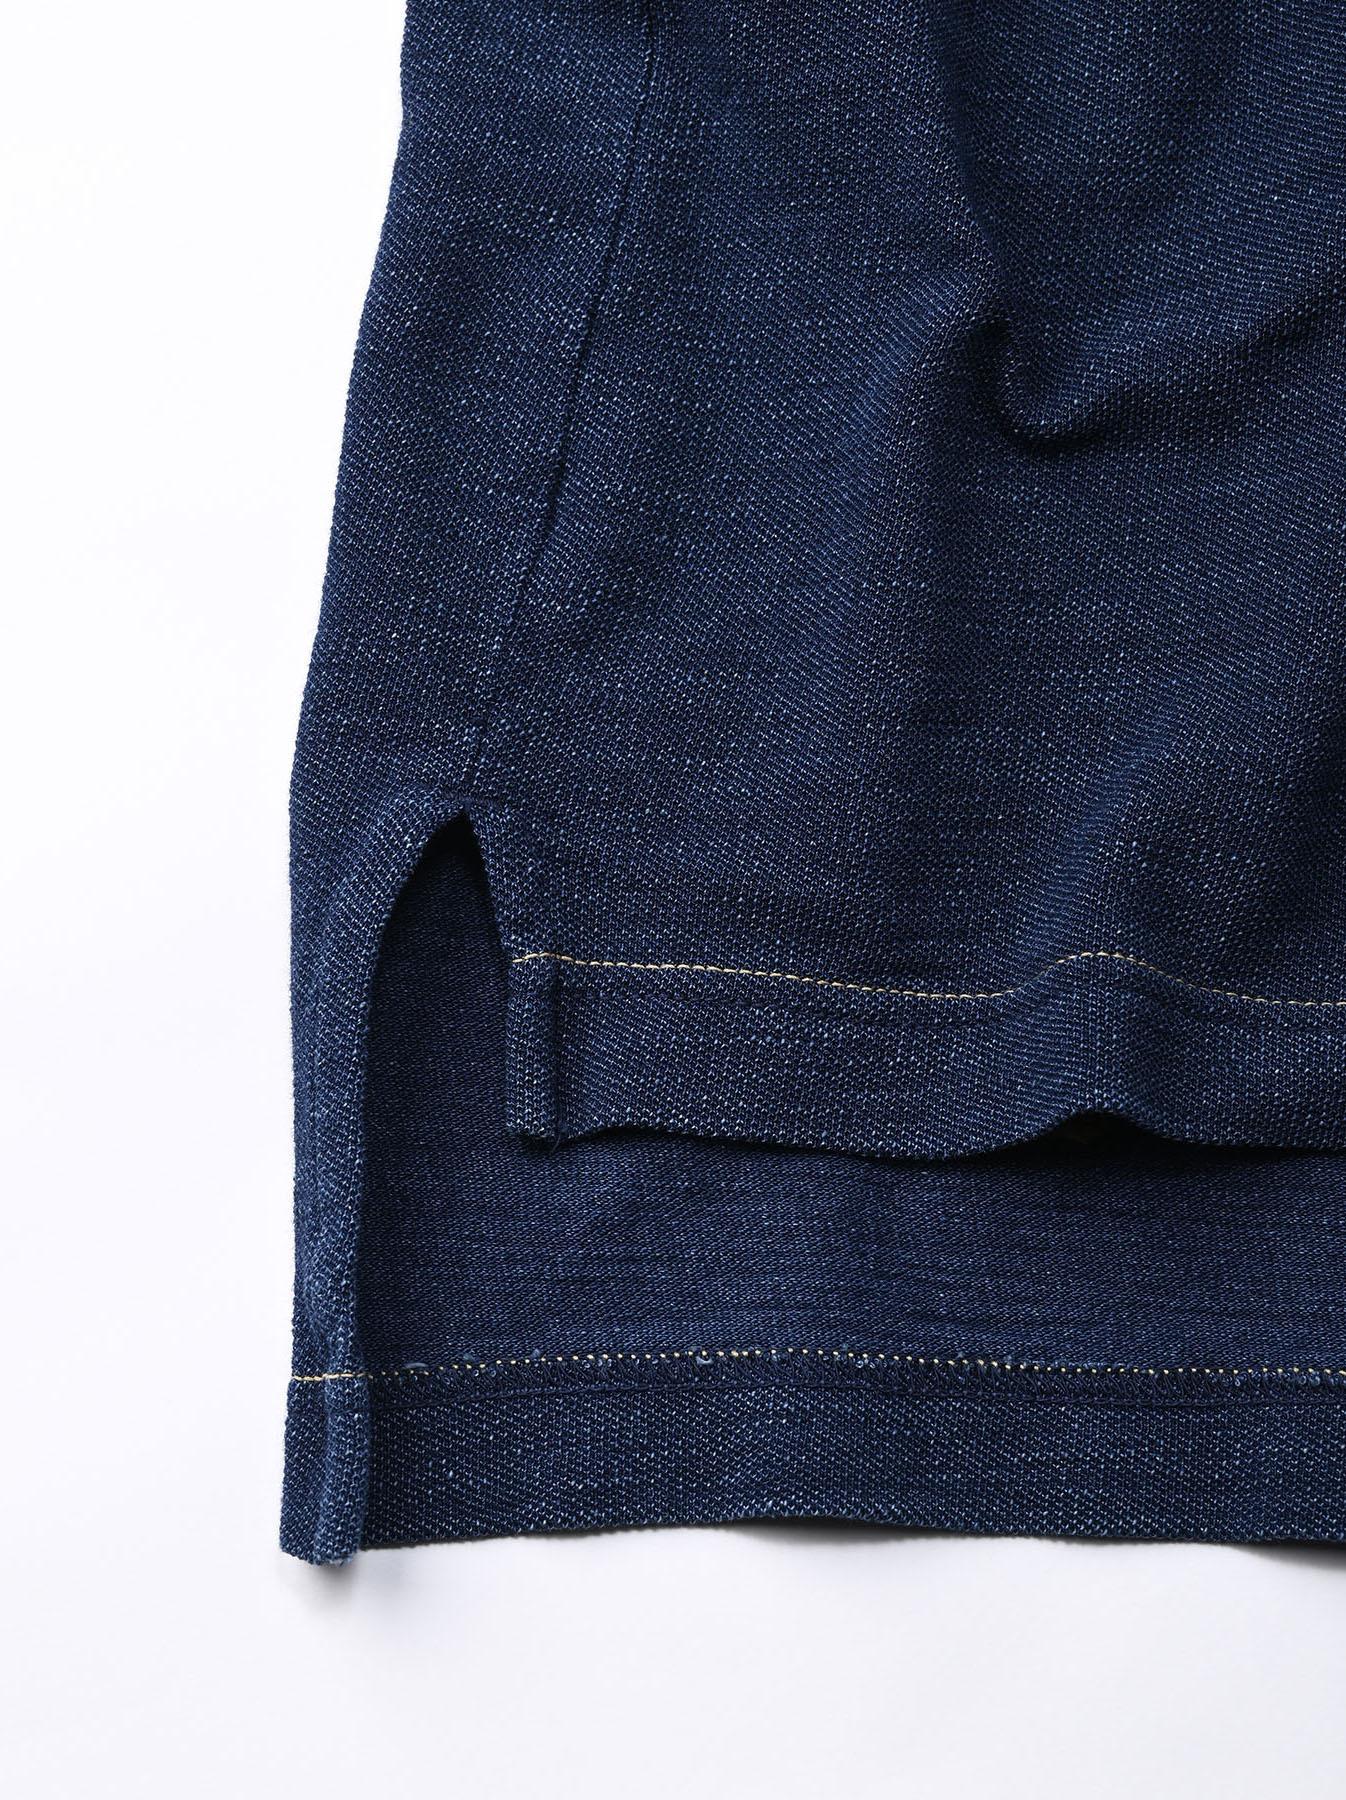 Indigo Kanoko Shiokaze Long-sleeved Square Polo Shirt (0521)-12